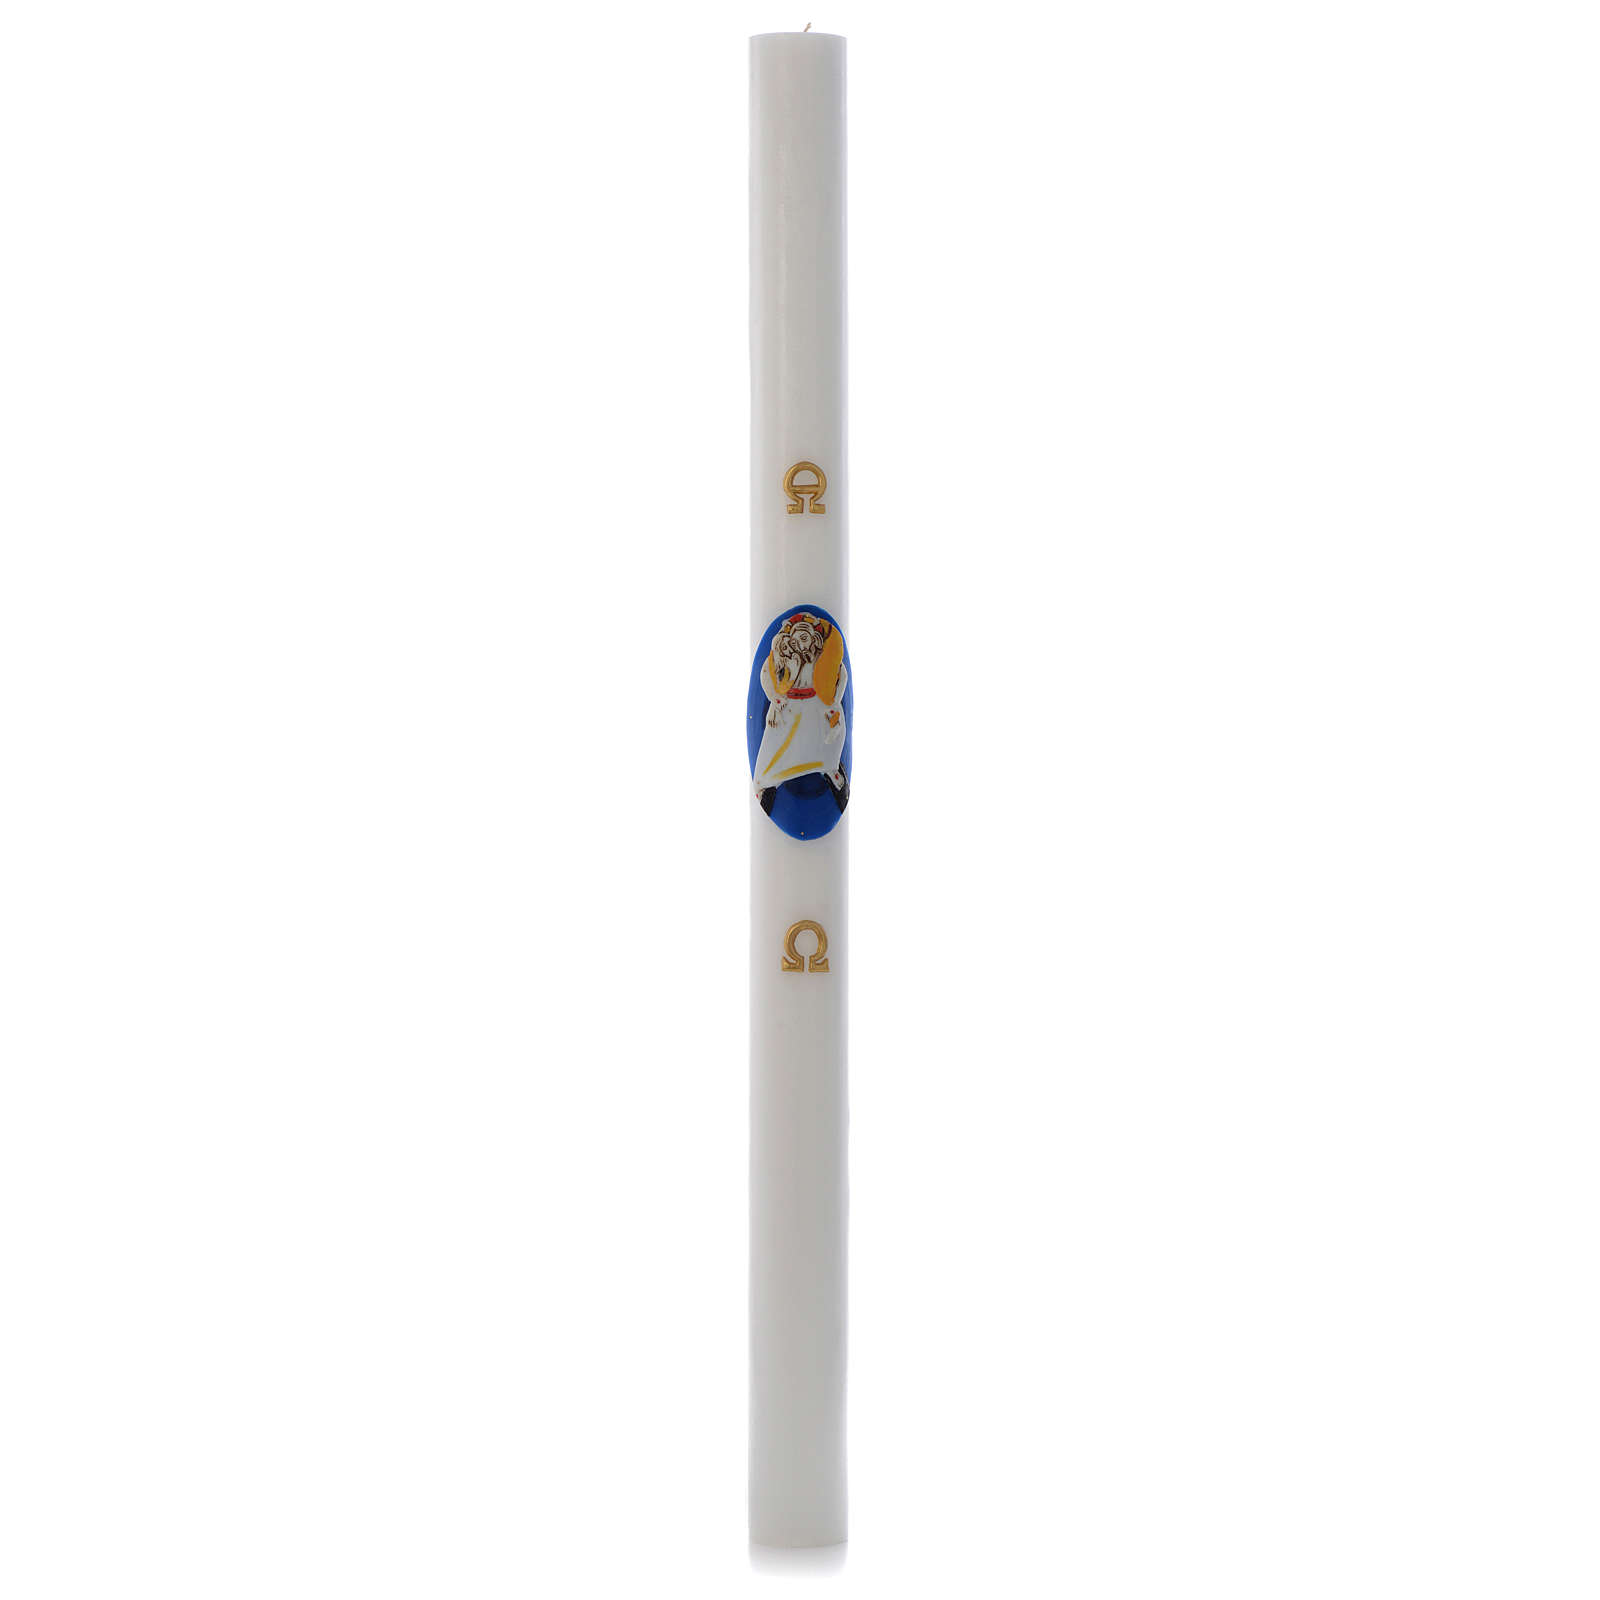 STOCK Cirio Pascual Logo Jubileo Misericordia cera blanca 8x120 cm 3